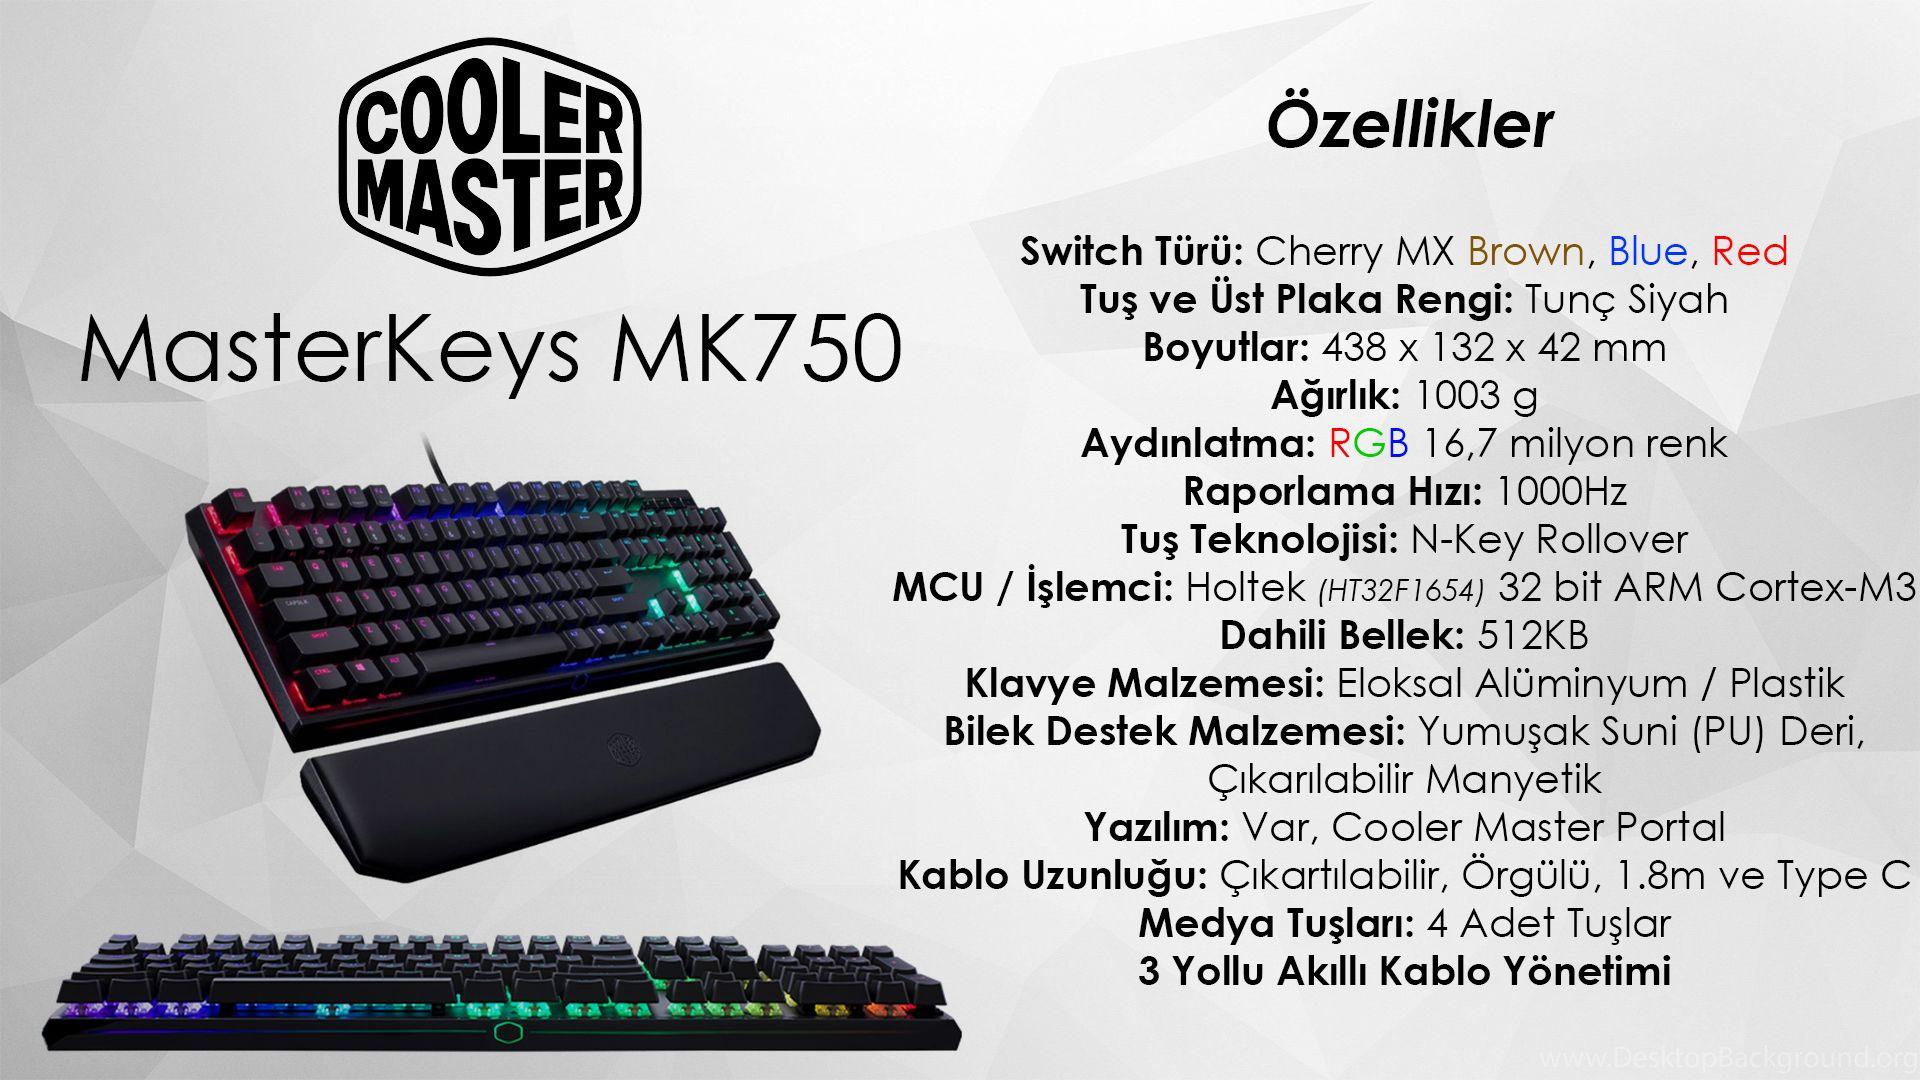 CM MasterKeys MK750 Özellikler.jpg